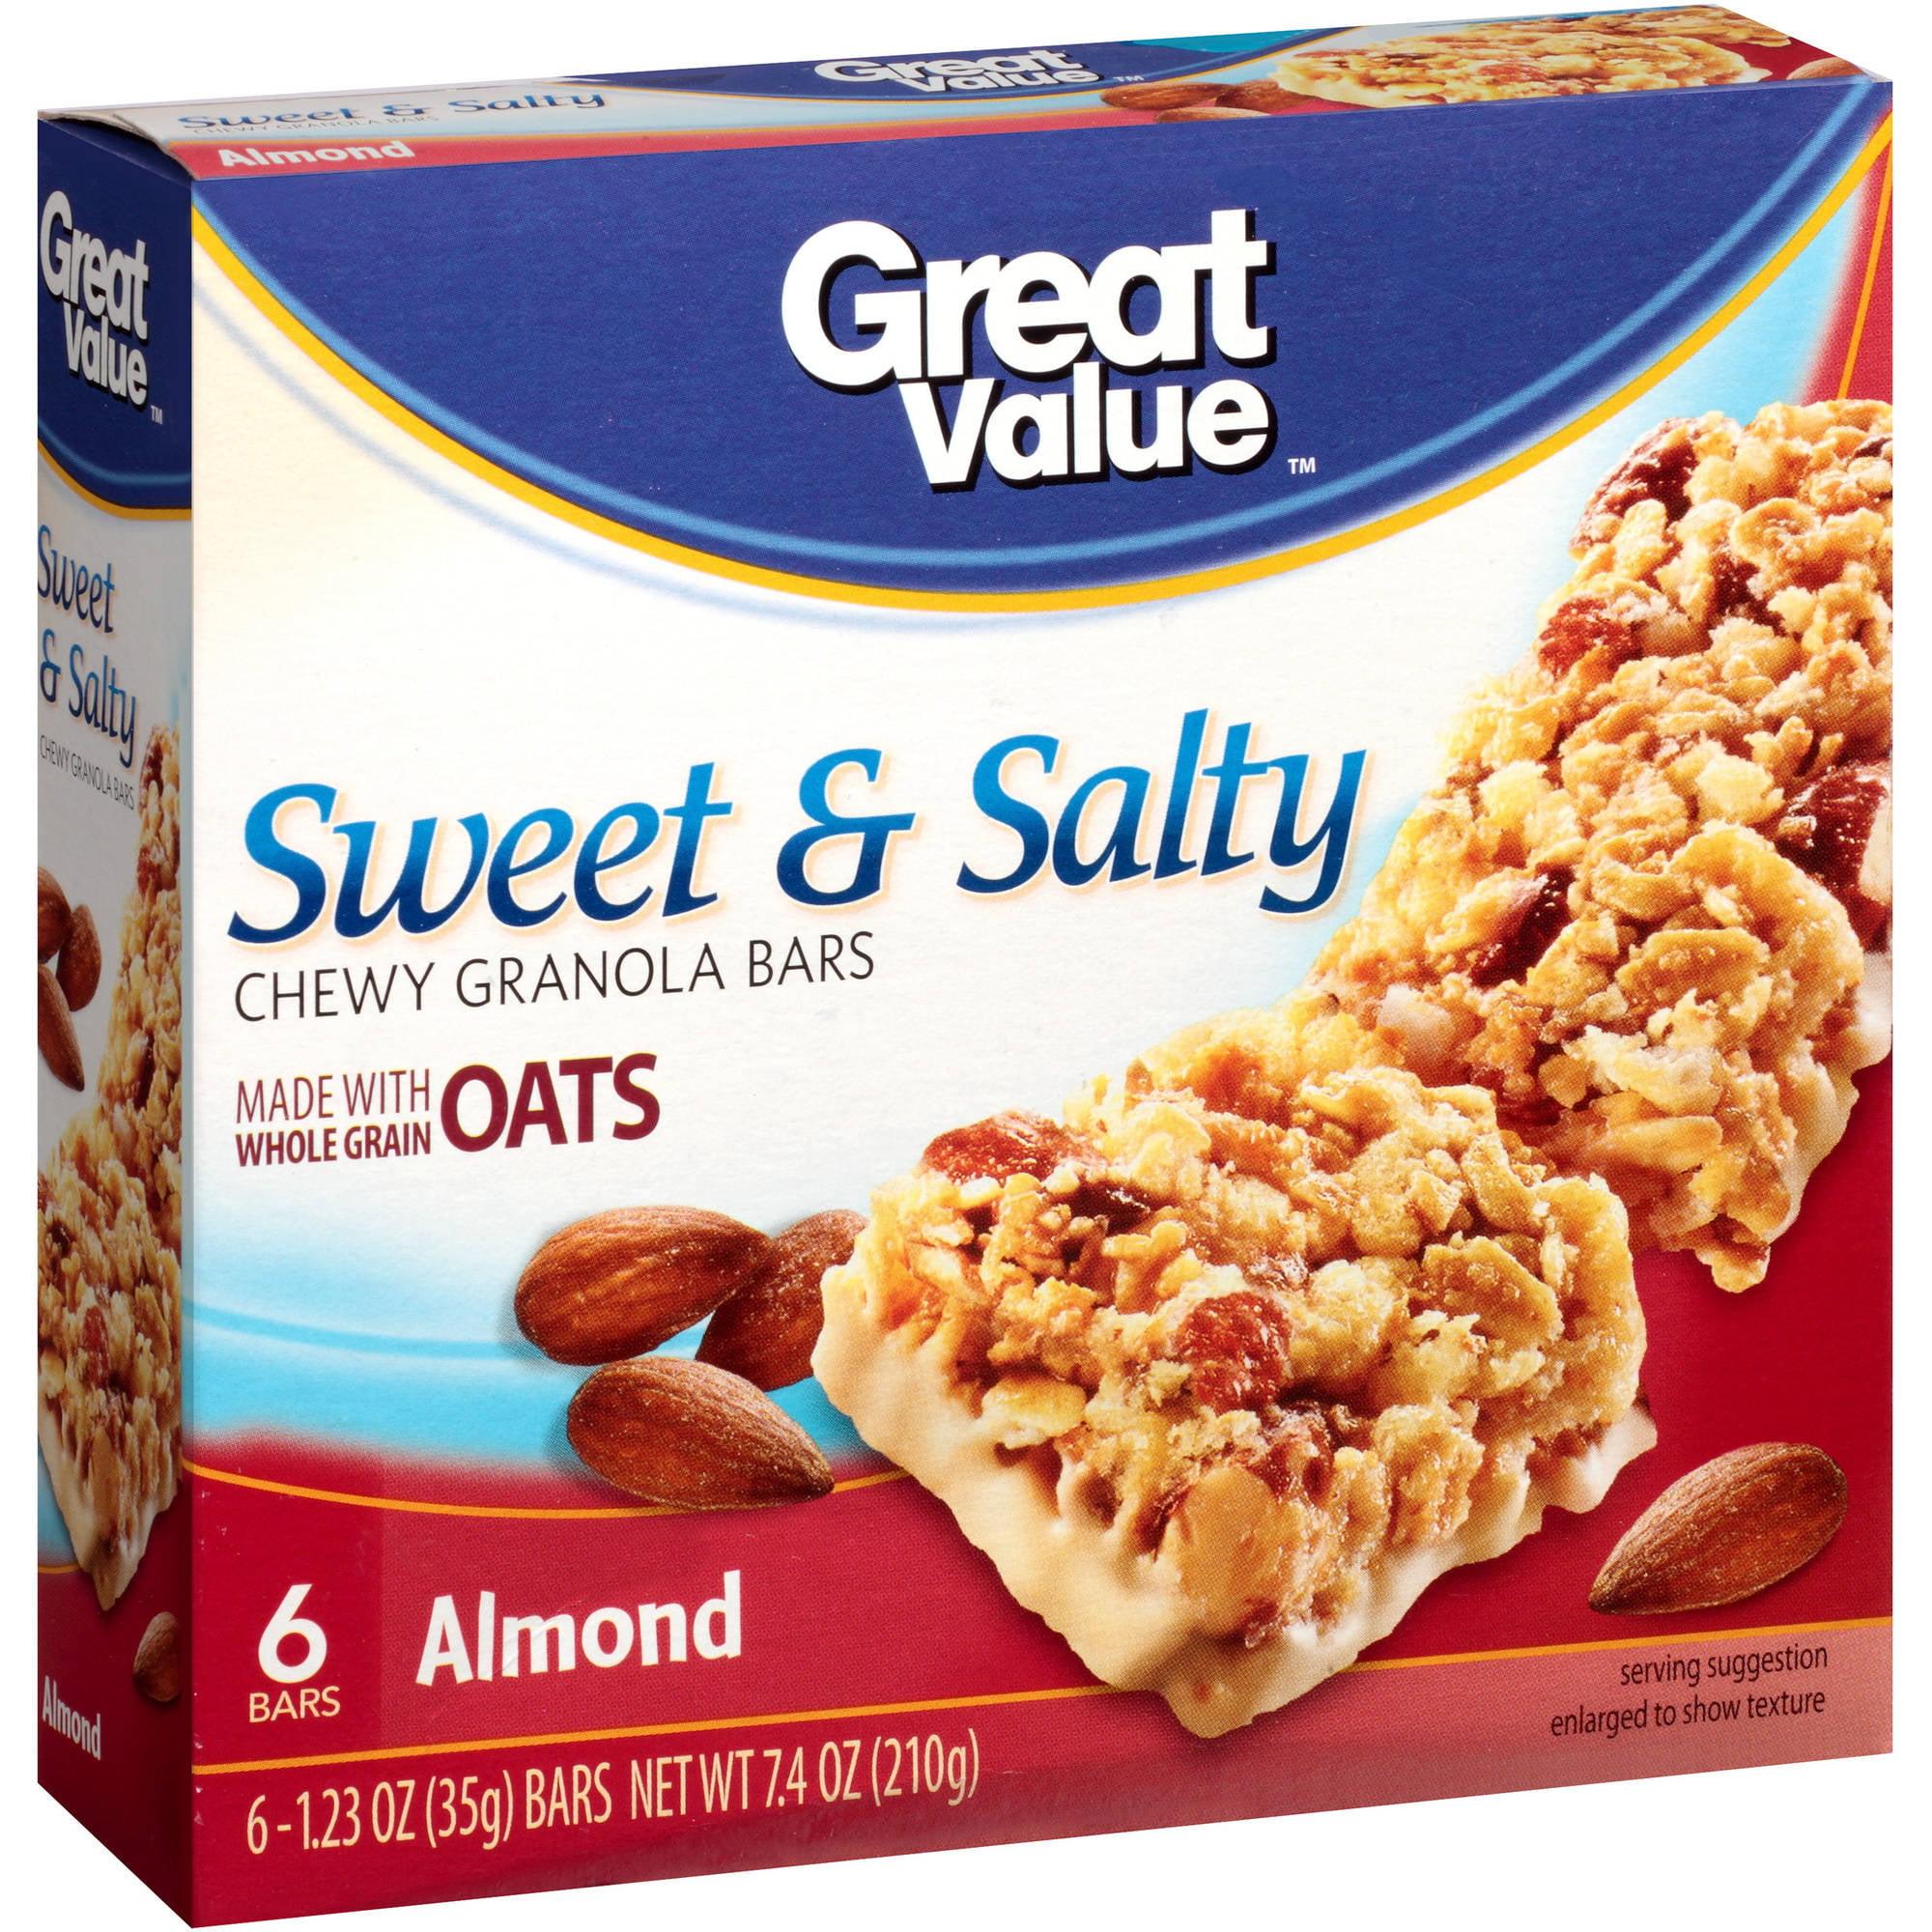 Great Value Sweet & Salty Almonds Granola Bars, 6 pk